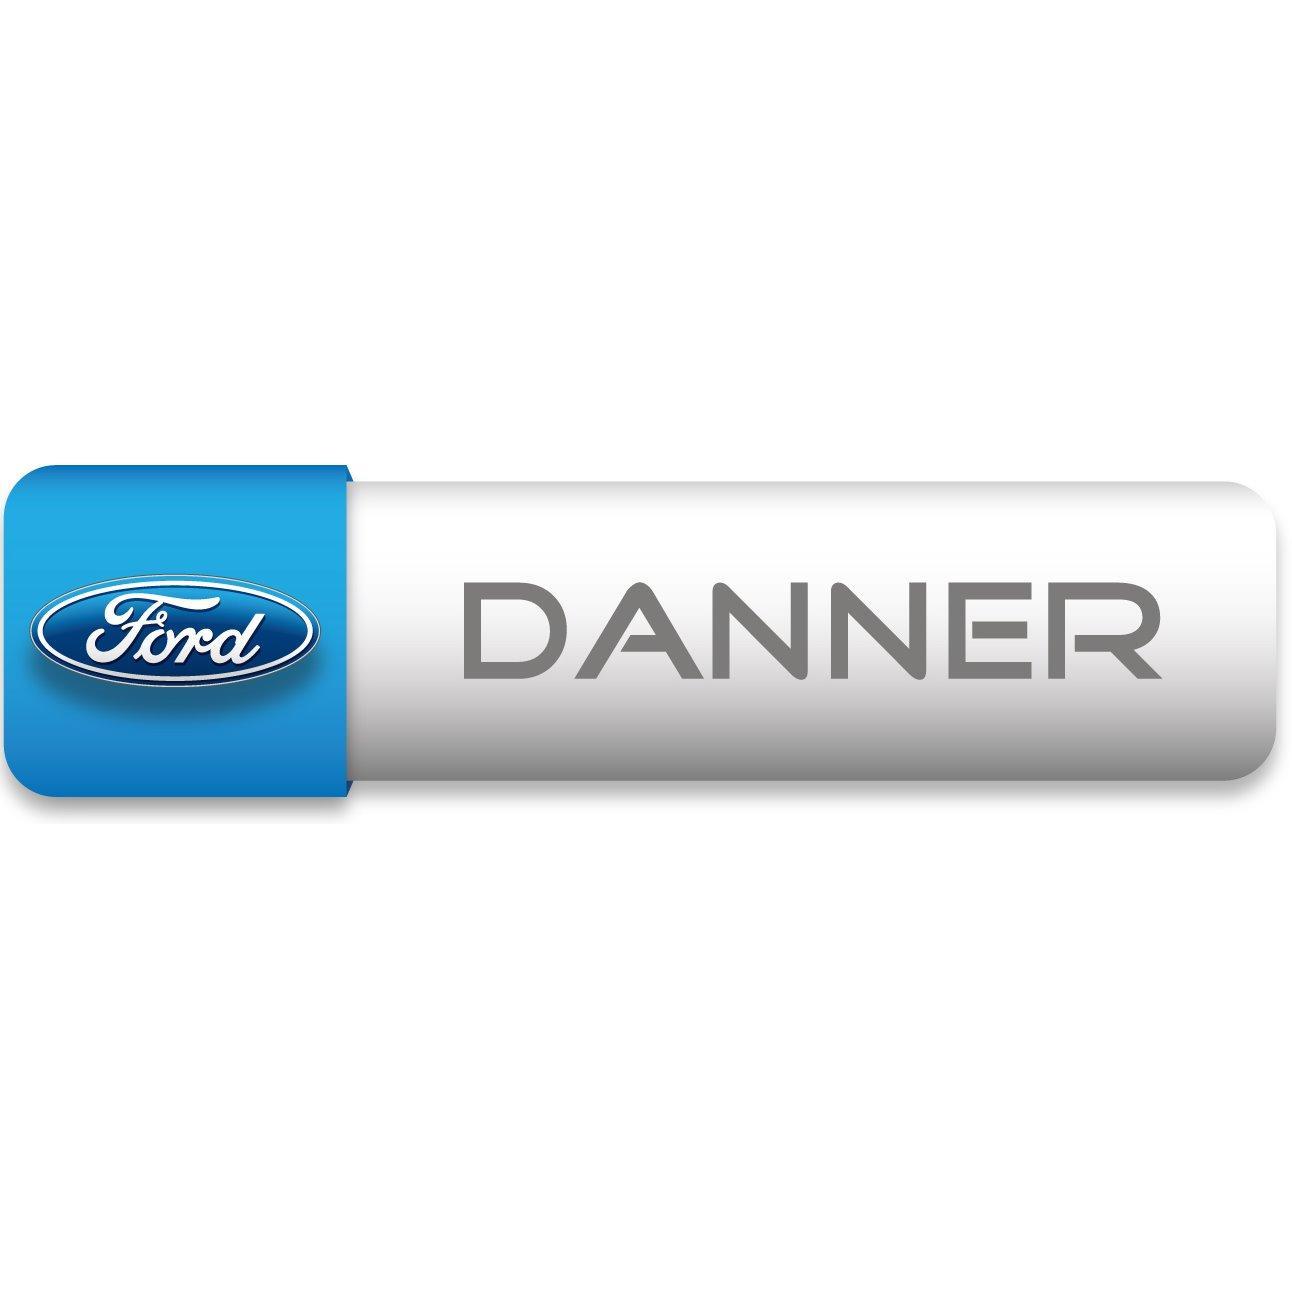 Autohaus Danner GmbH